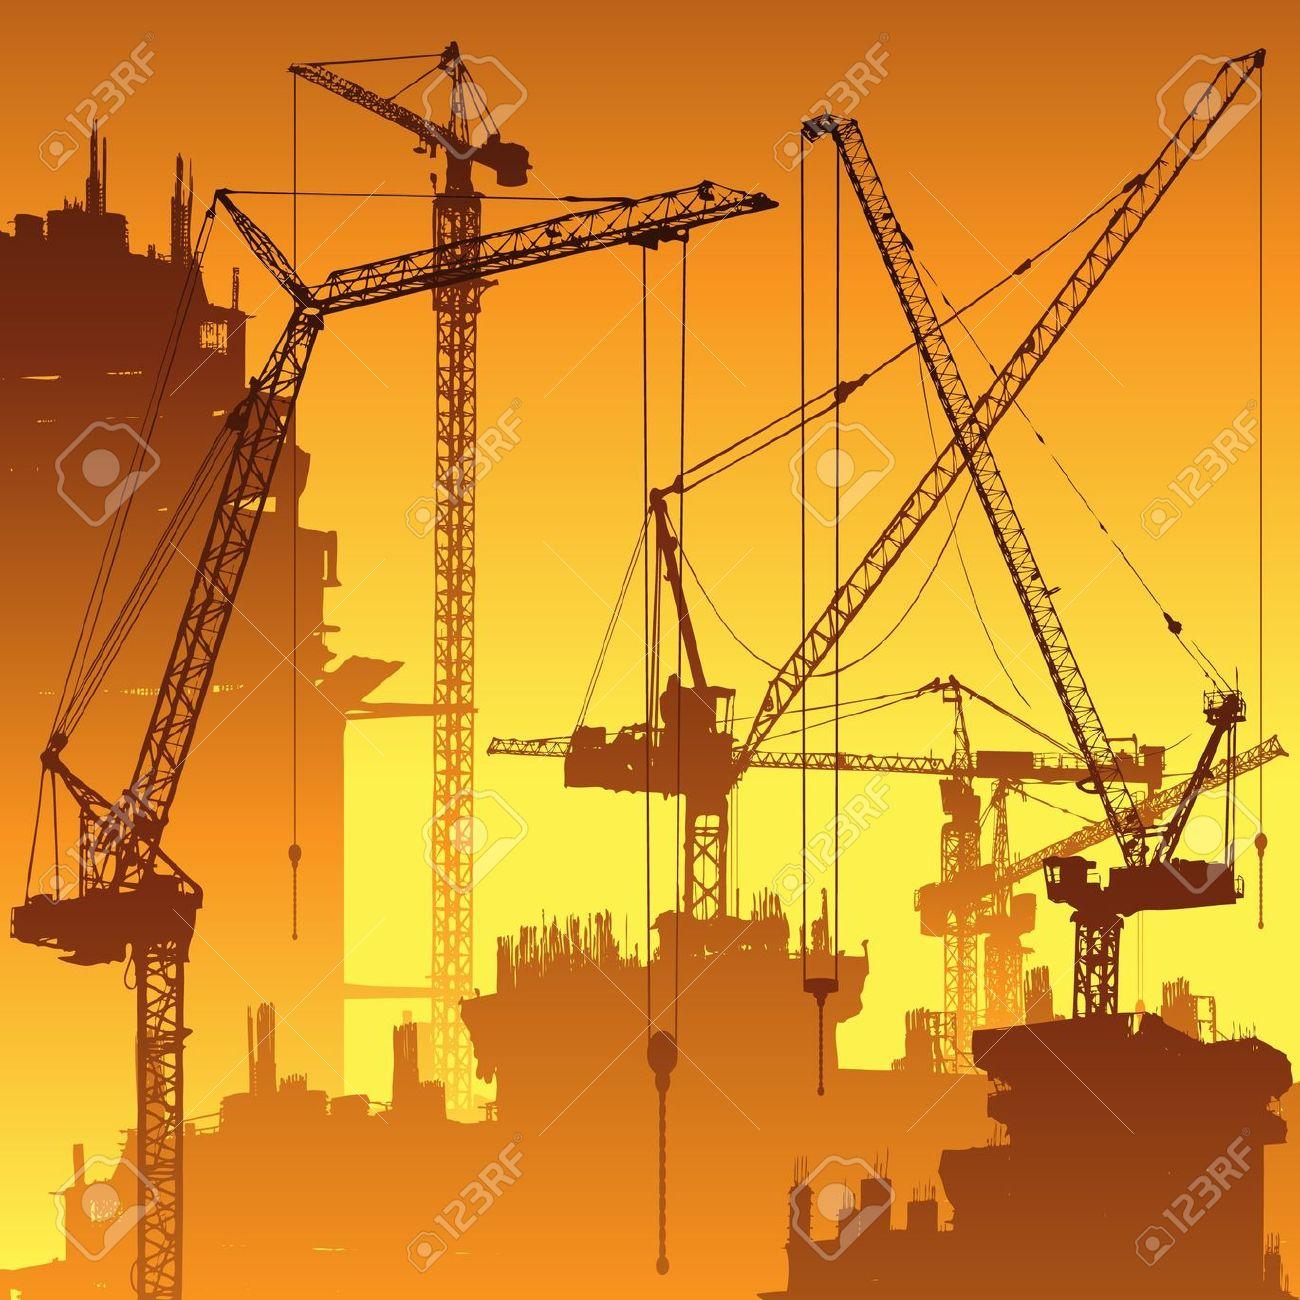 Construction clipart background.